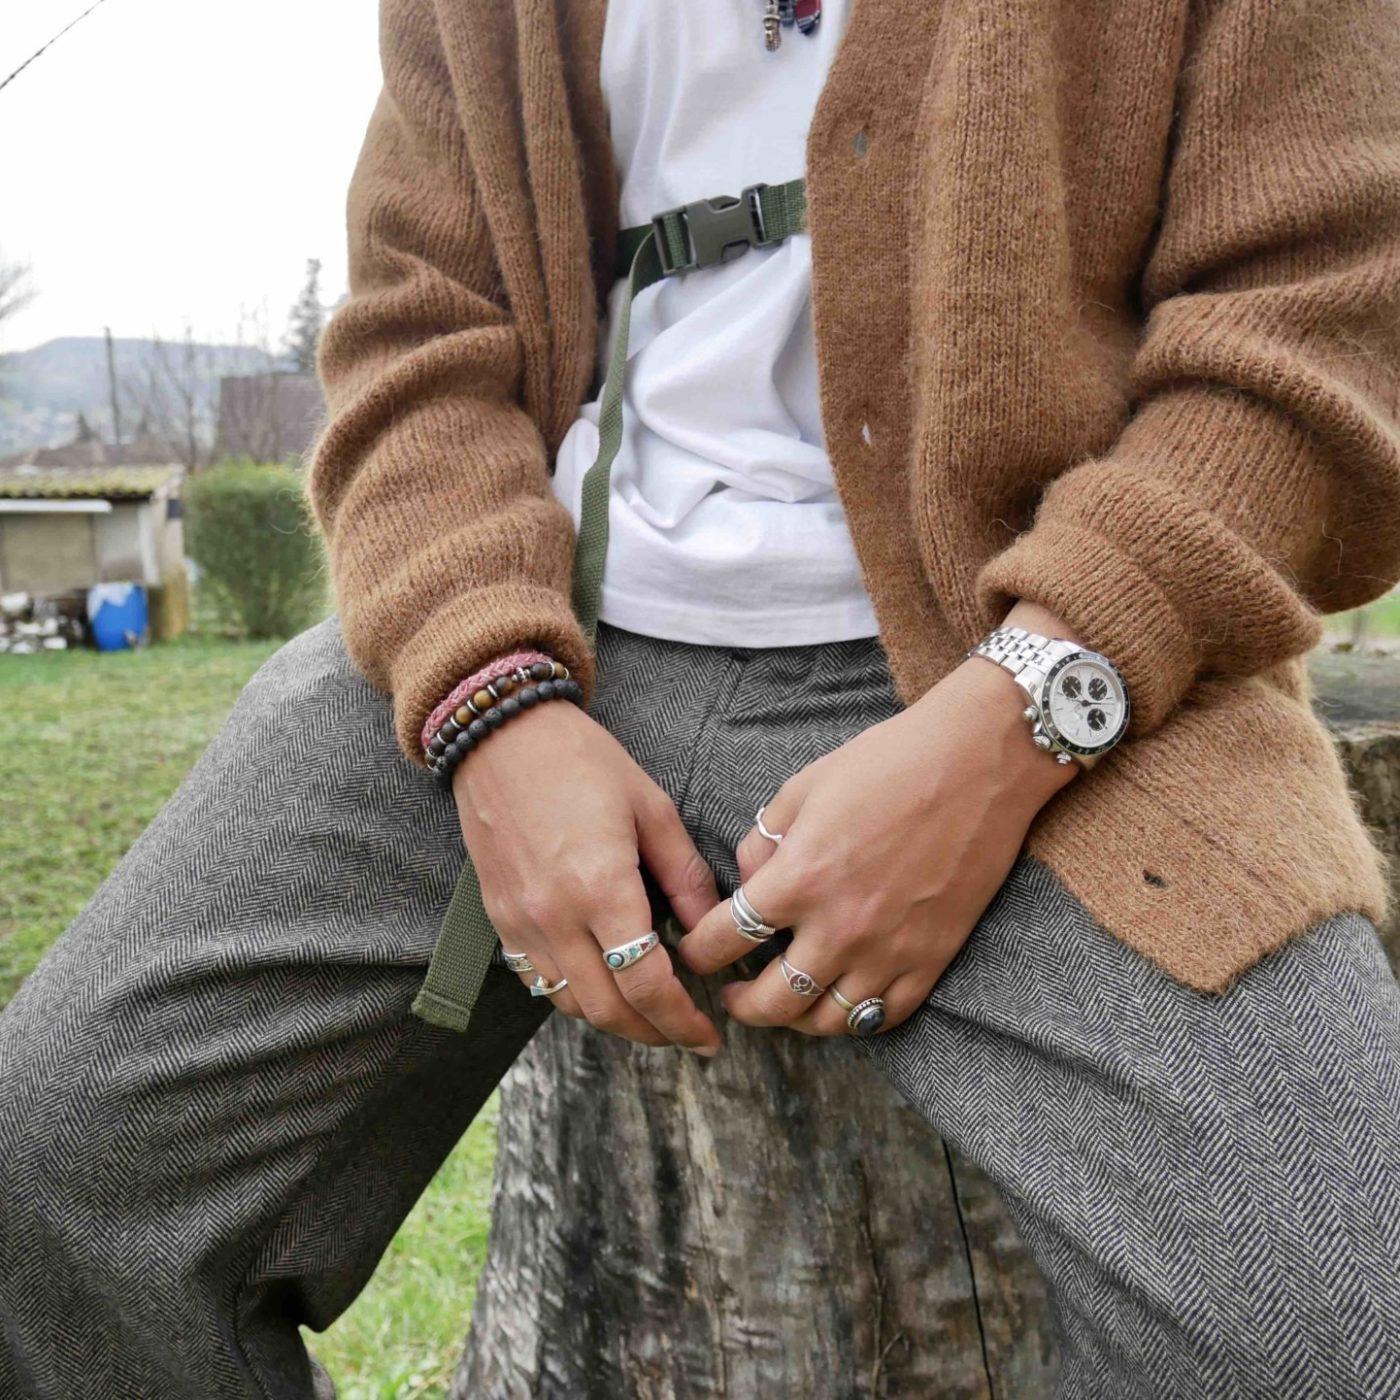 bucket_kaptain_sunshine_cardigan_cos_tee_batoner_pantalon_evan_kinro_clarks_wallabees_beams_4